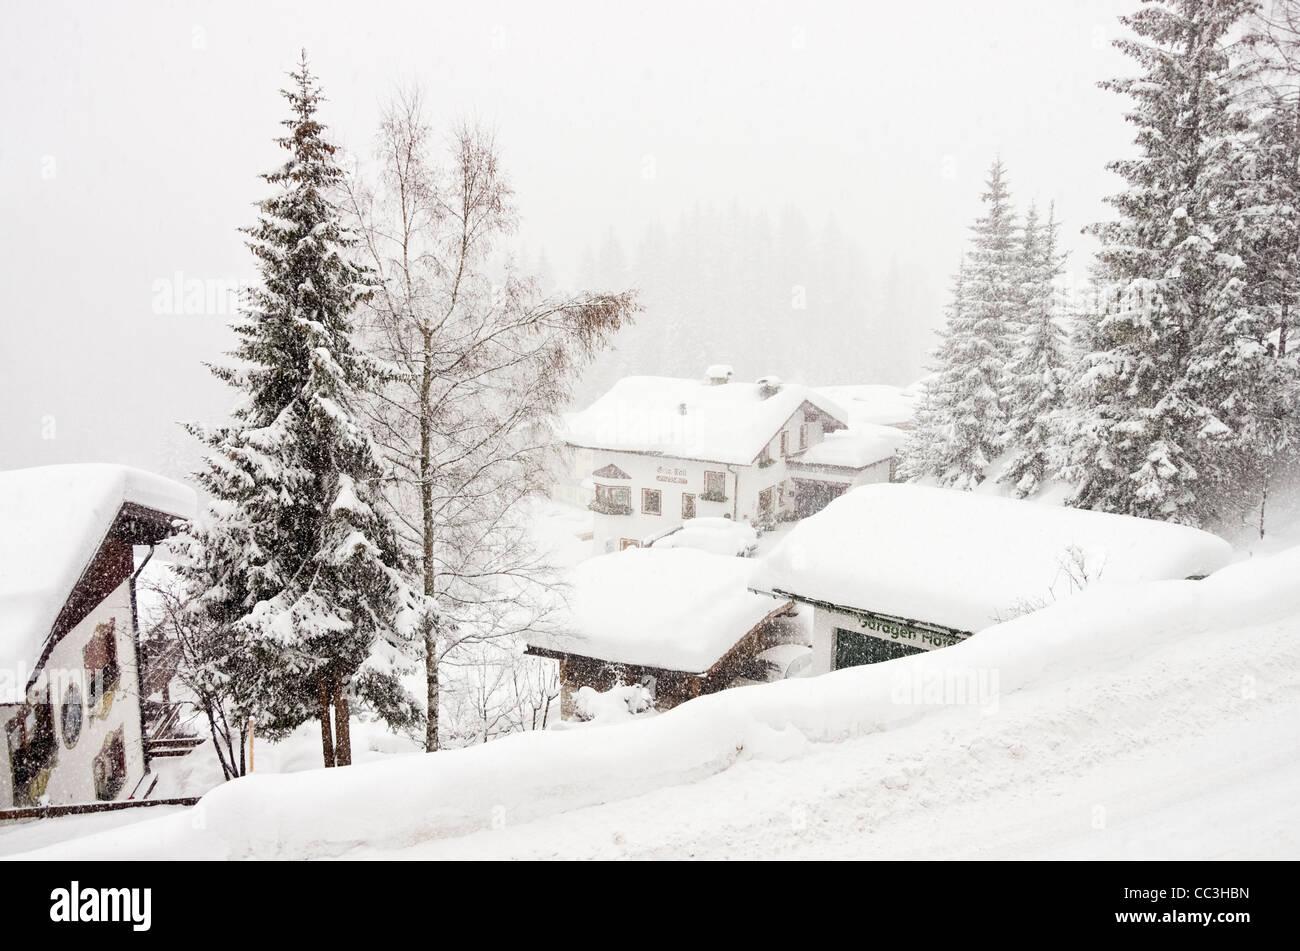 St Anton am Arlberg, Tyrol, Austria. Traditional Austrian village buildings during heavy snowfall in winter - Stock Image